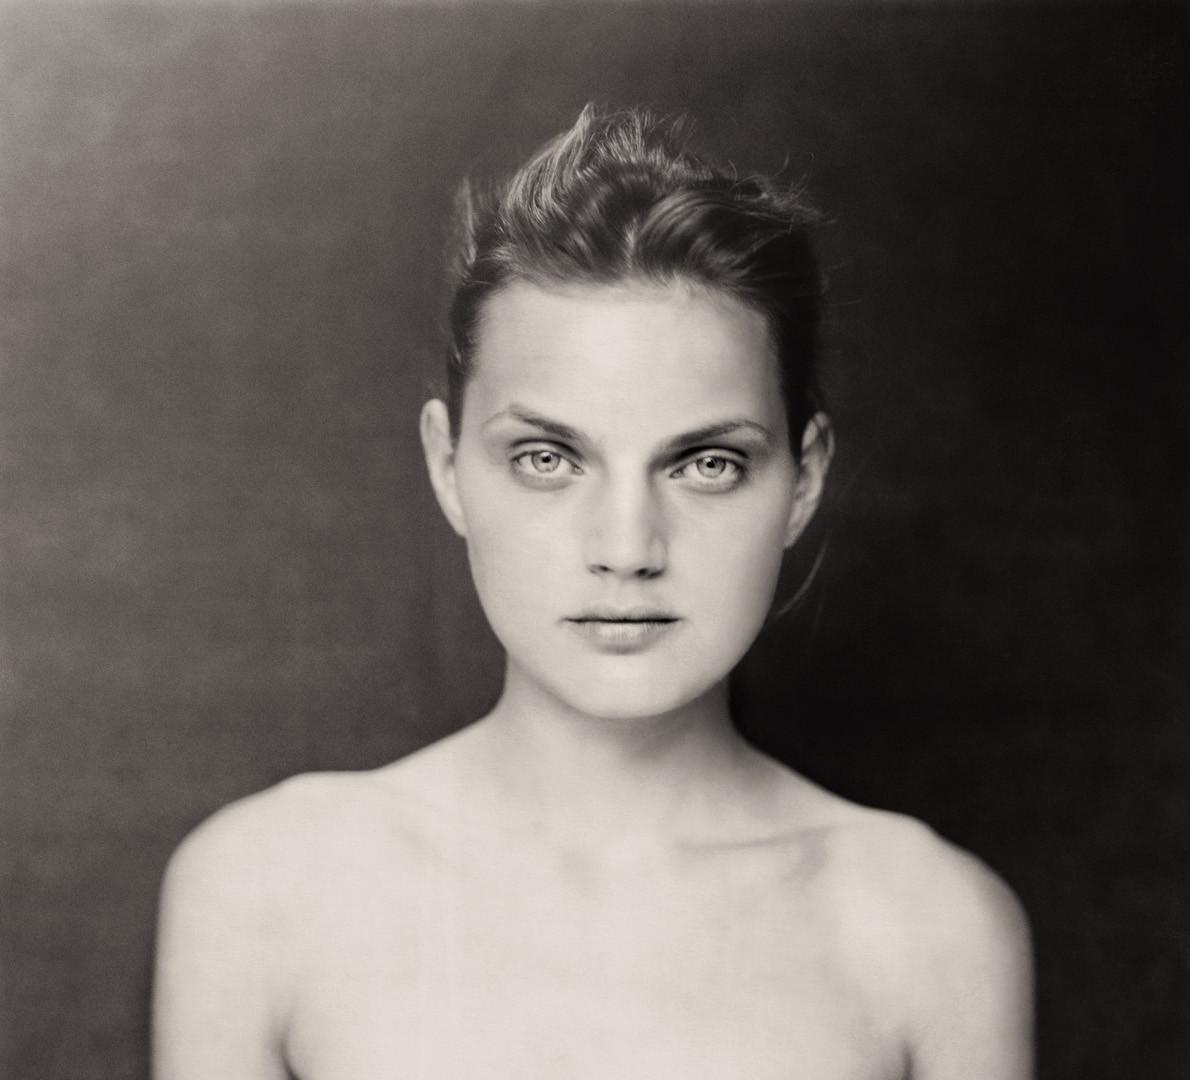 Paolo Roversi, Dark nude portrait of Guinevere II, Paris, 1996